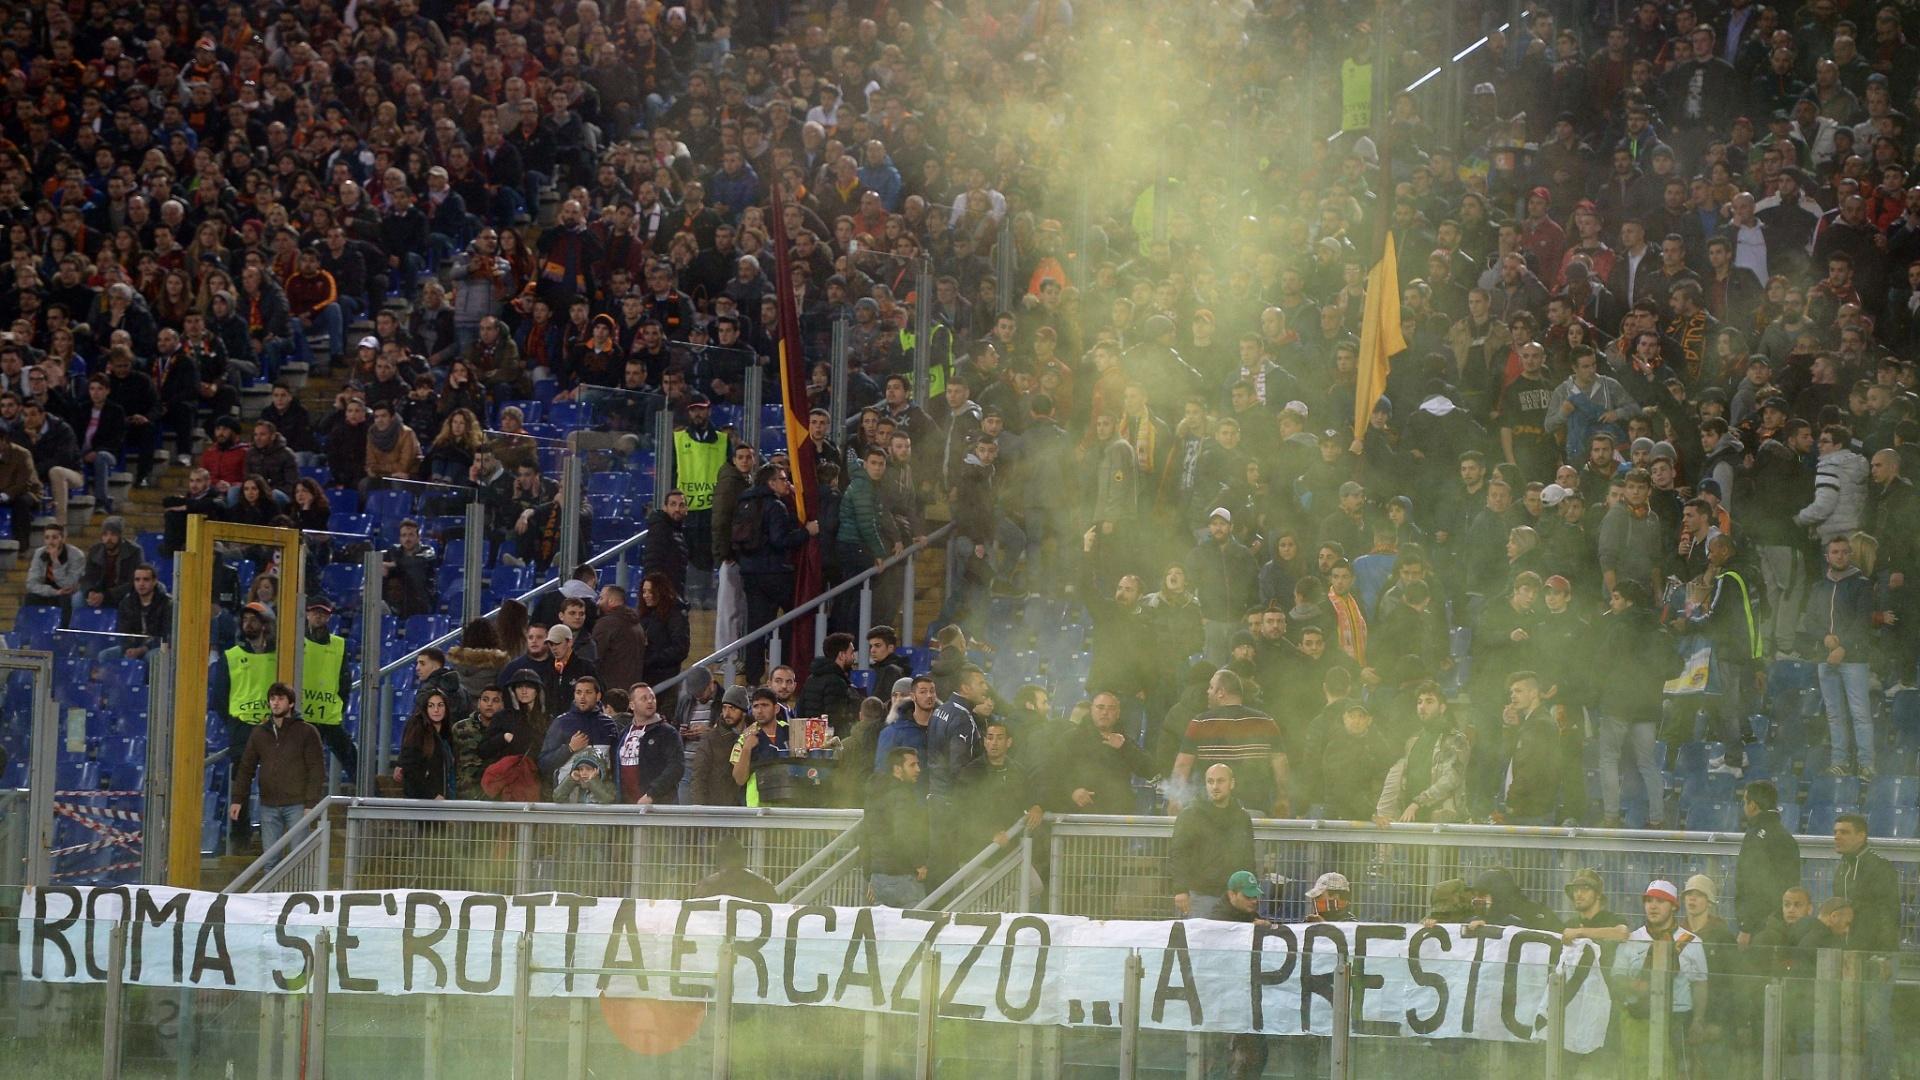 Irritada, torcida da Roma deixa recado para a equipe